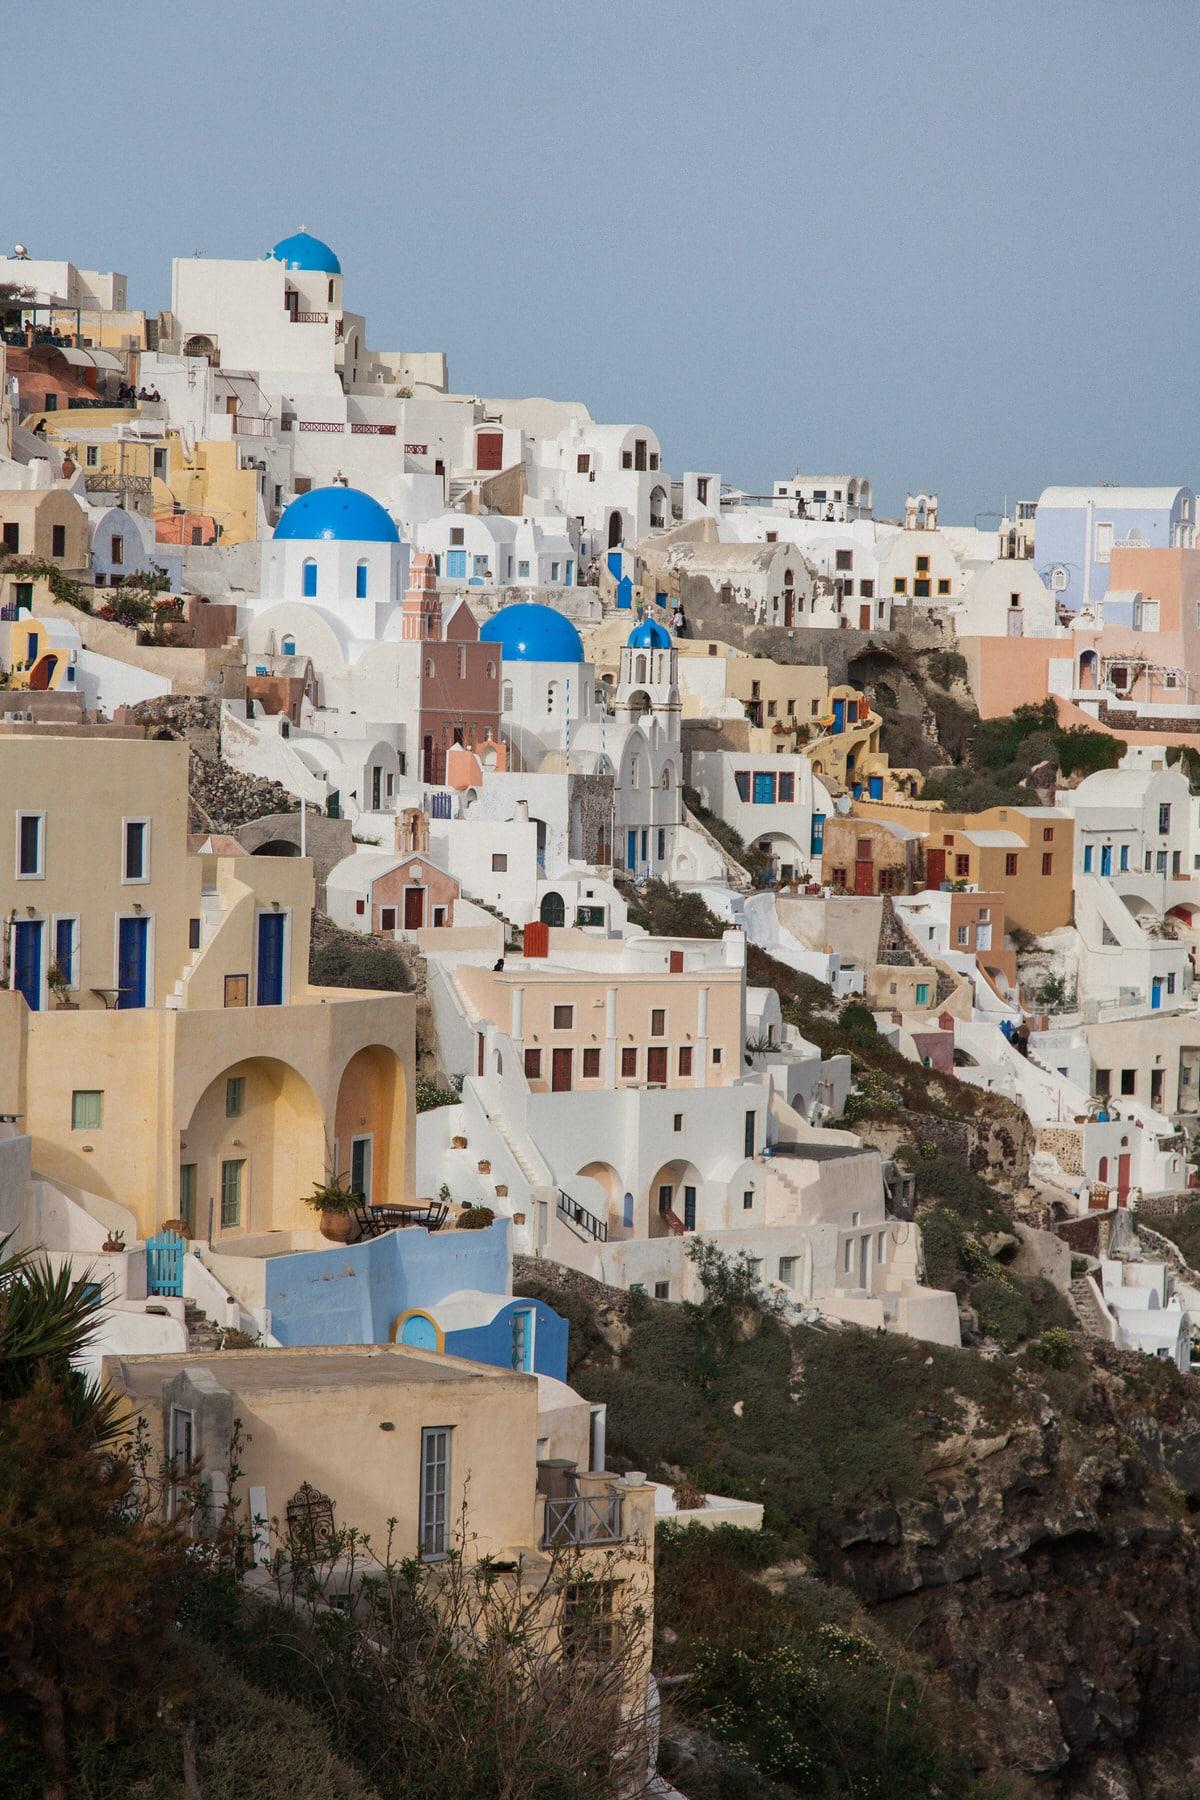 Santorini-Greece-black-and-white-fine-art-photography-by-Studio-L-photographer-Laura-Schneider-_2934